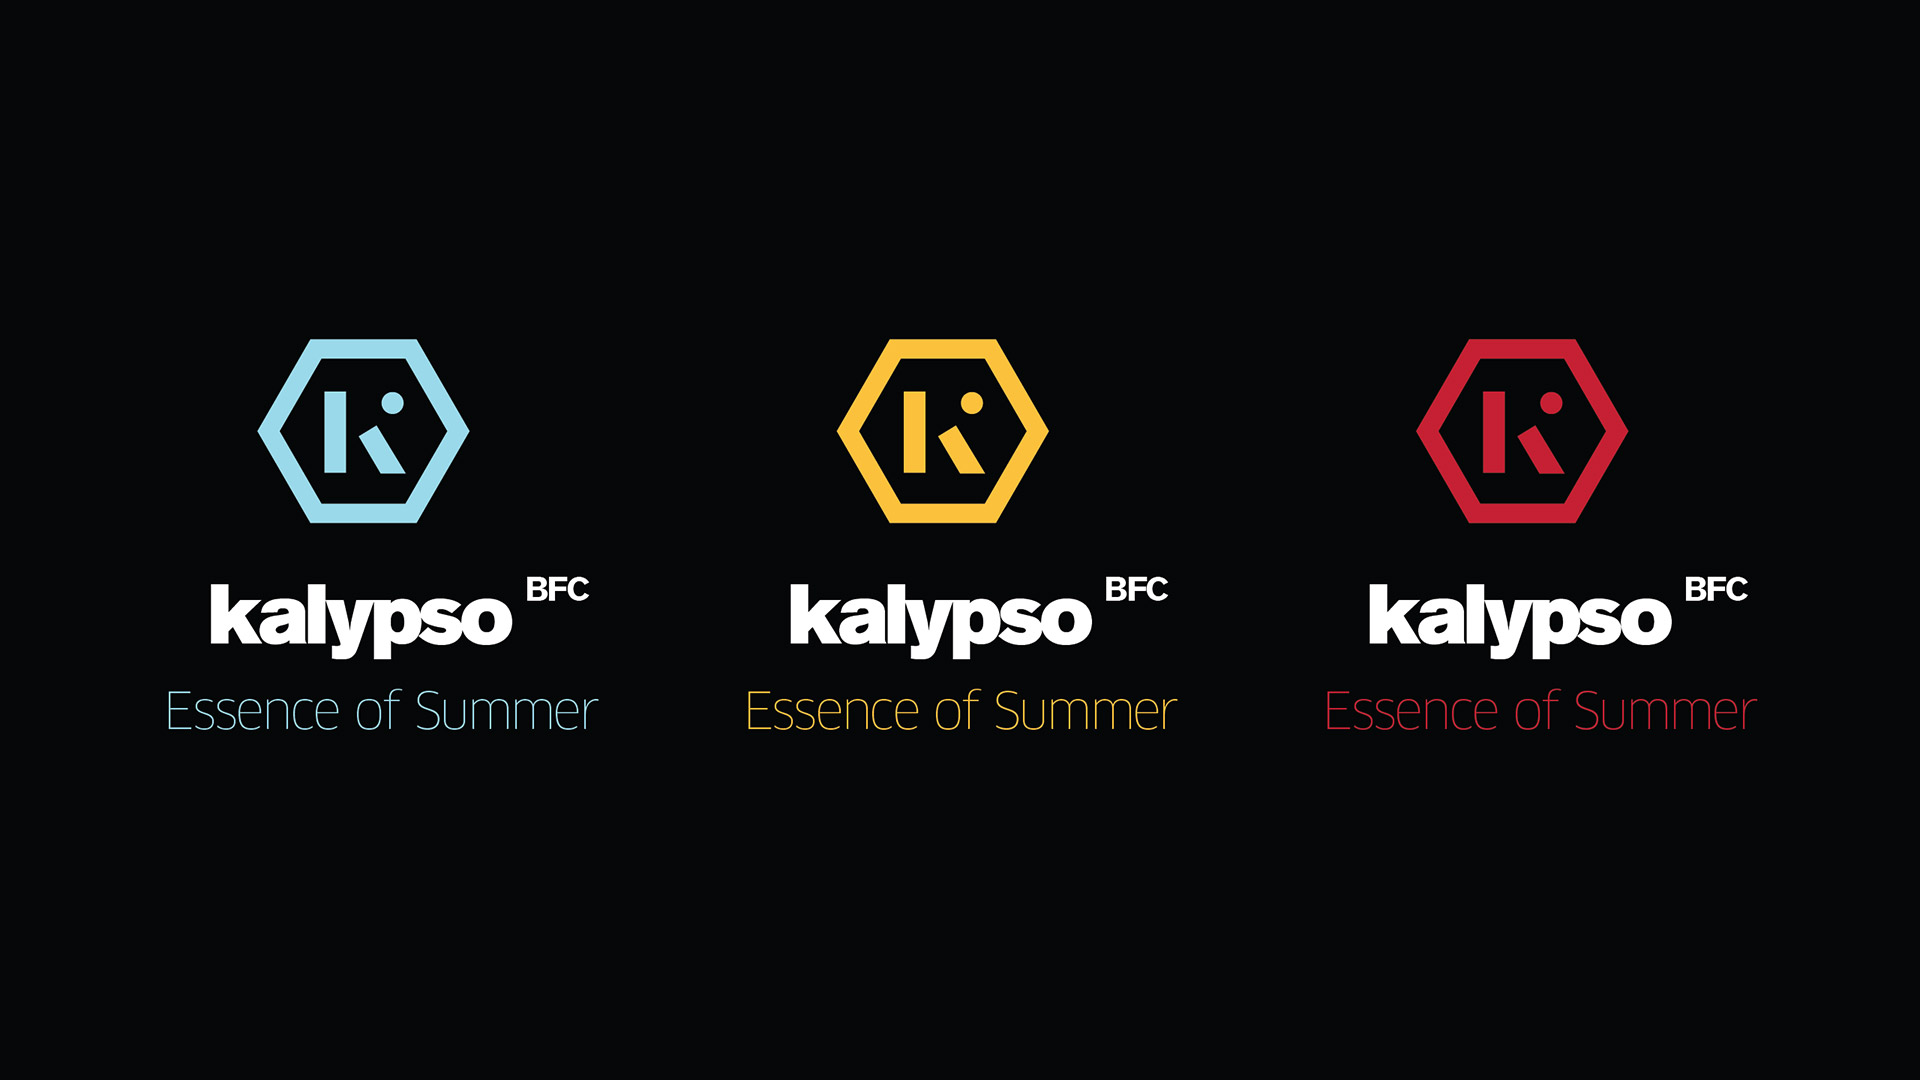 kalypso_port-03